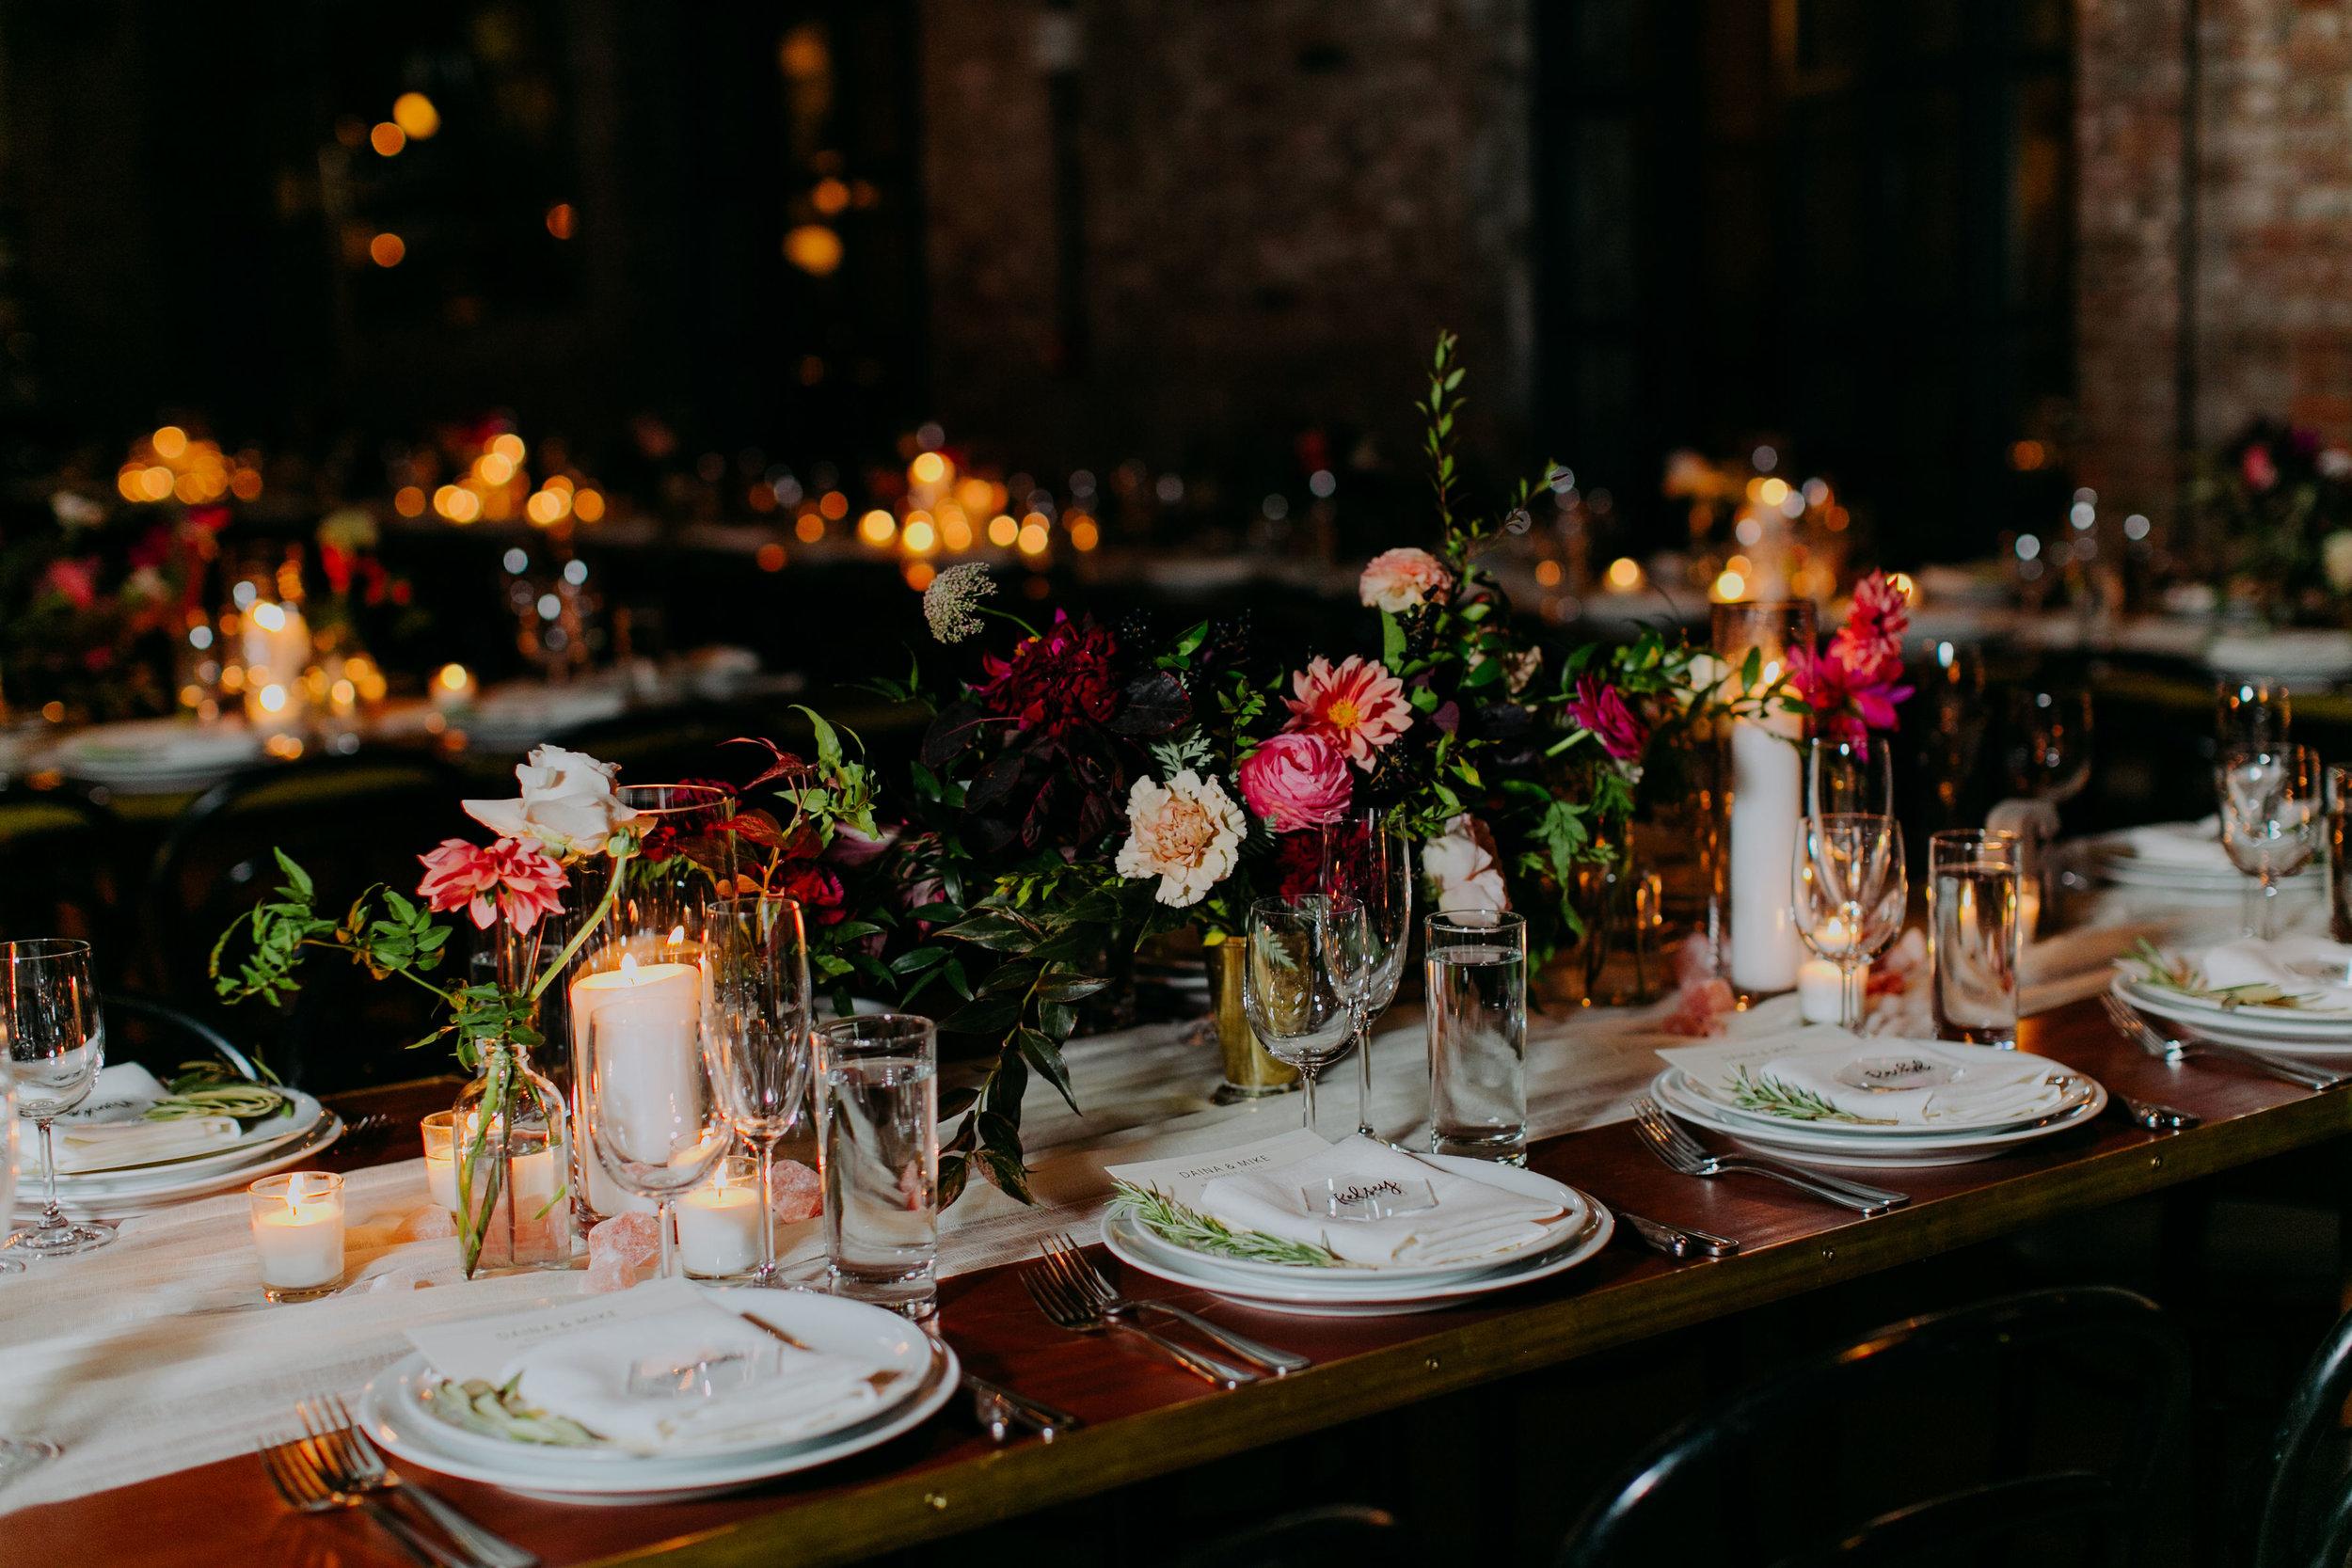 wythe-hotel-wedding-photographer-amber-gress-0453.jpg